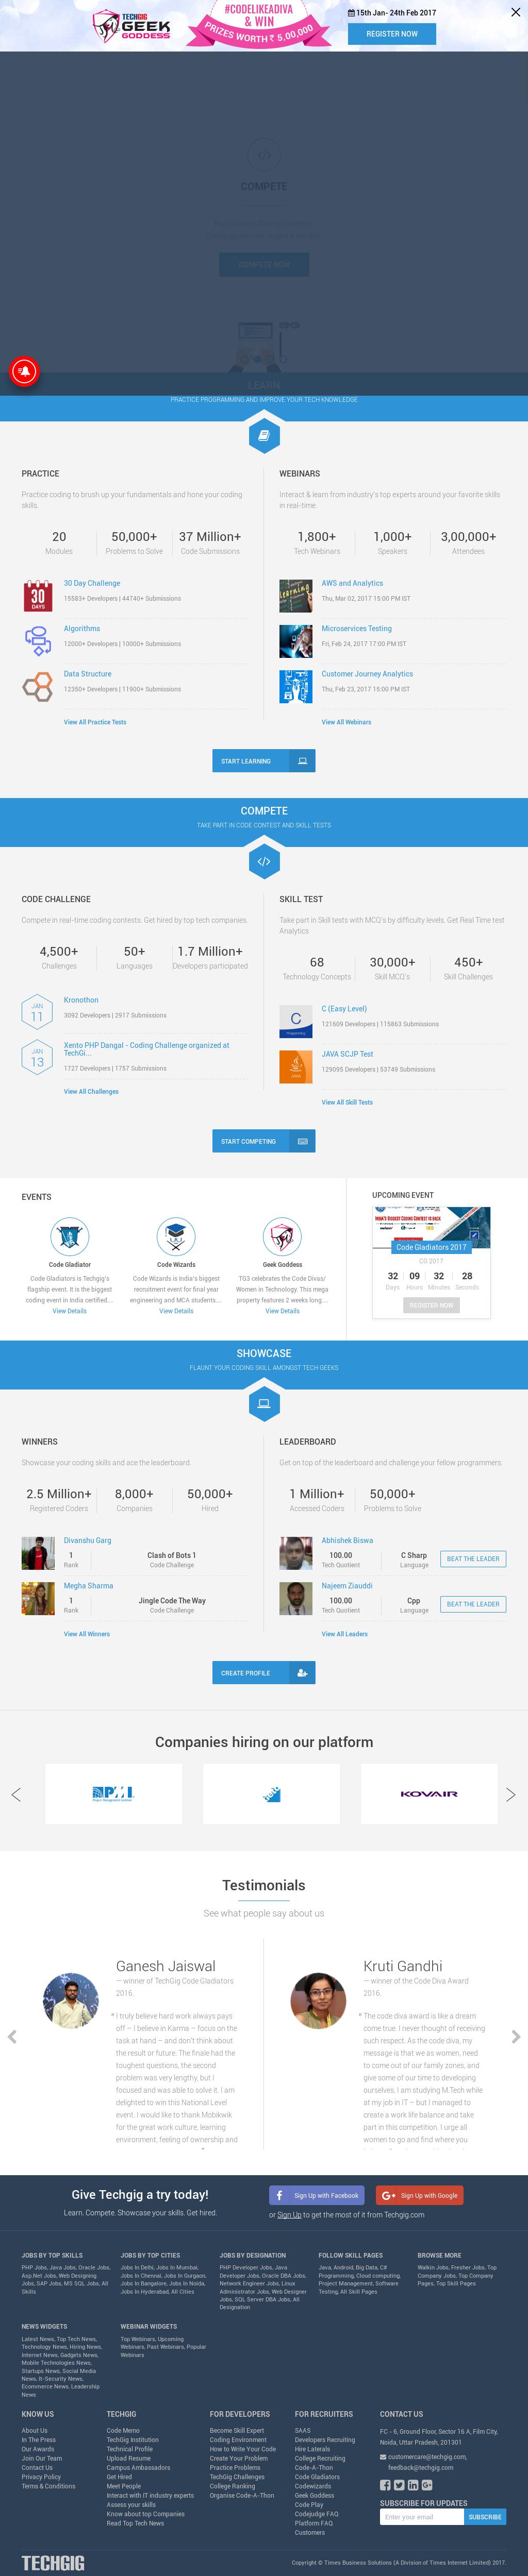 Techgig Competitors, Revenue and Employees - Owler Company Profile